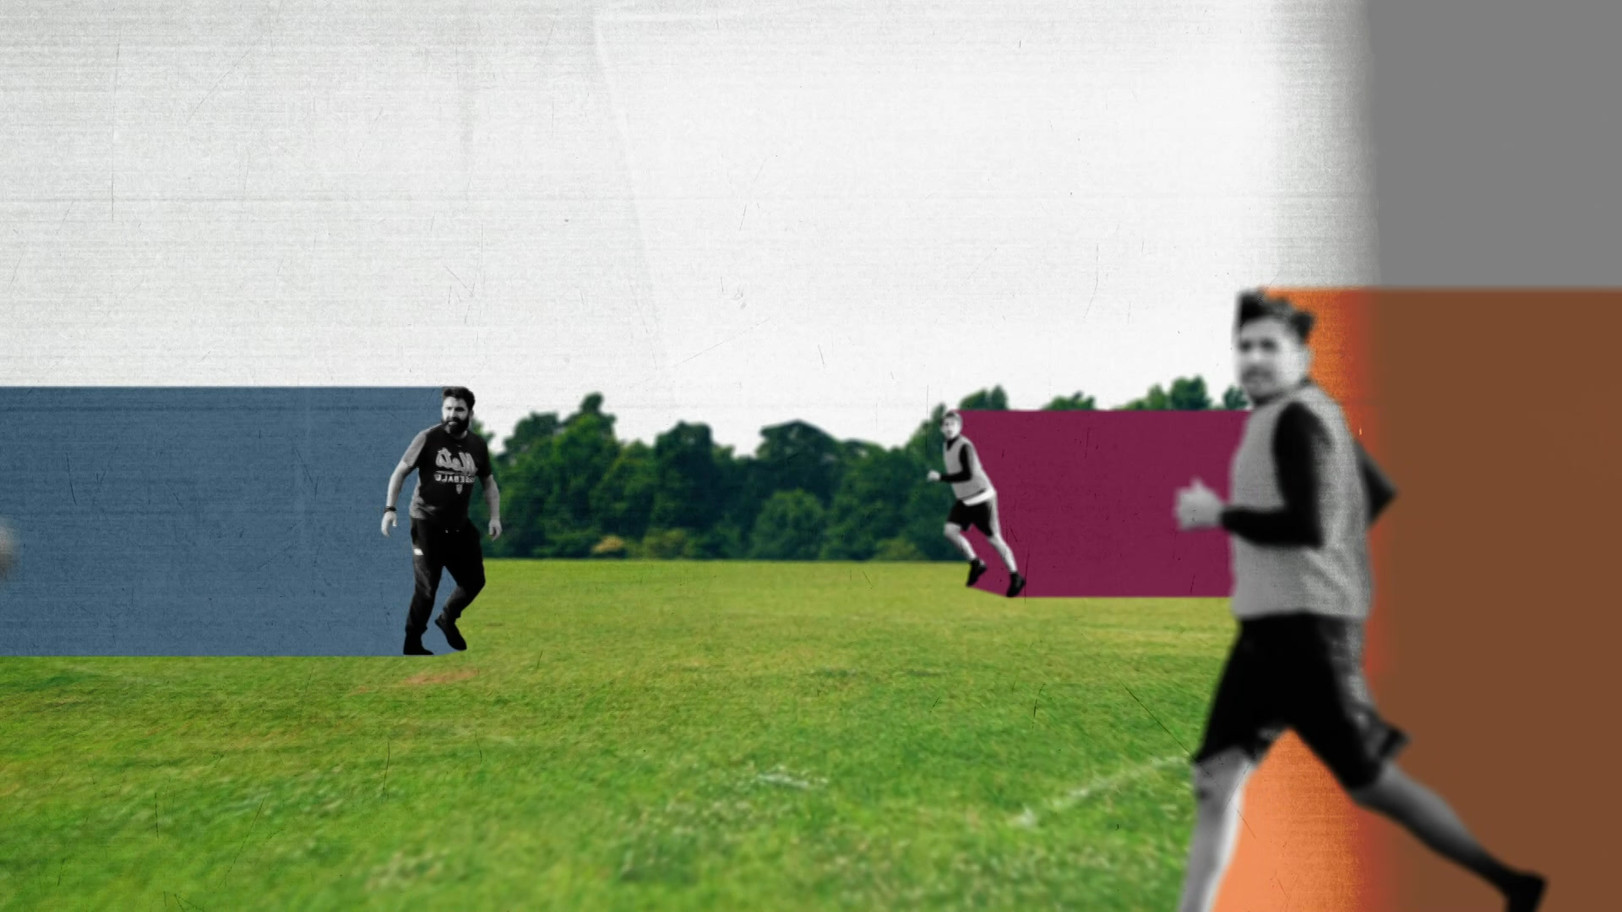 Motion_Collage_Edinburgh_2.mp4